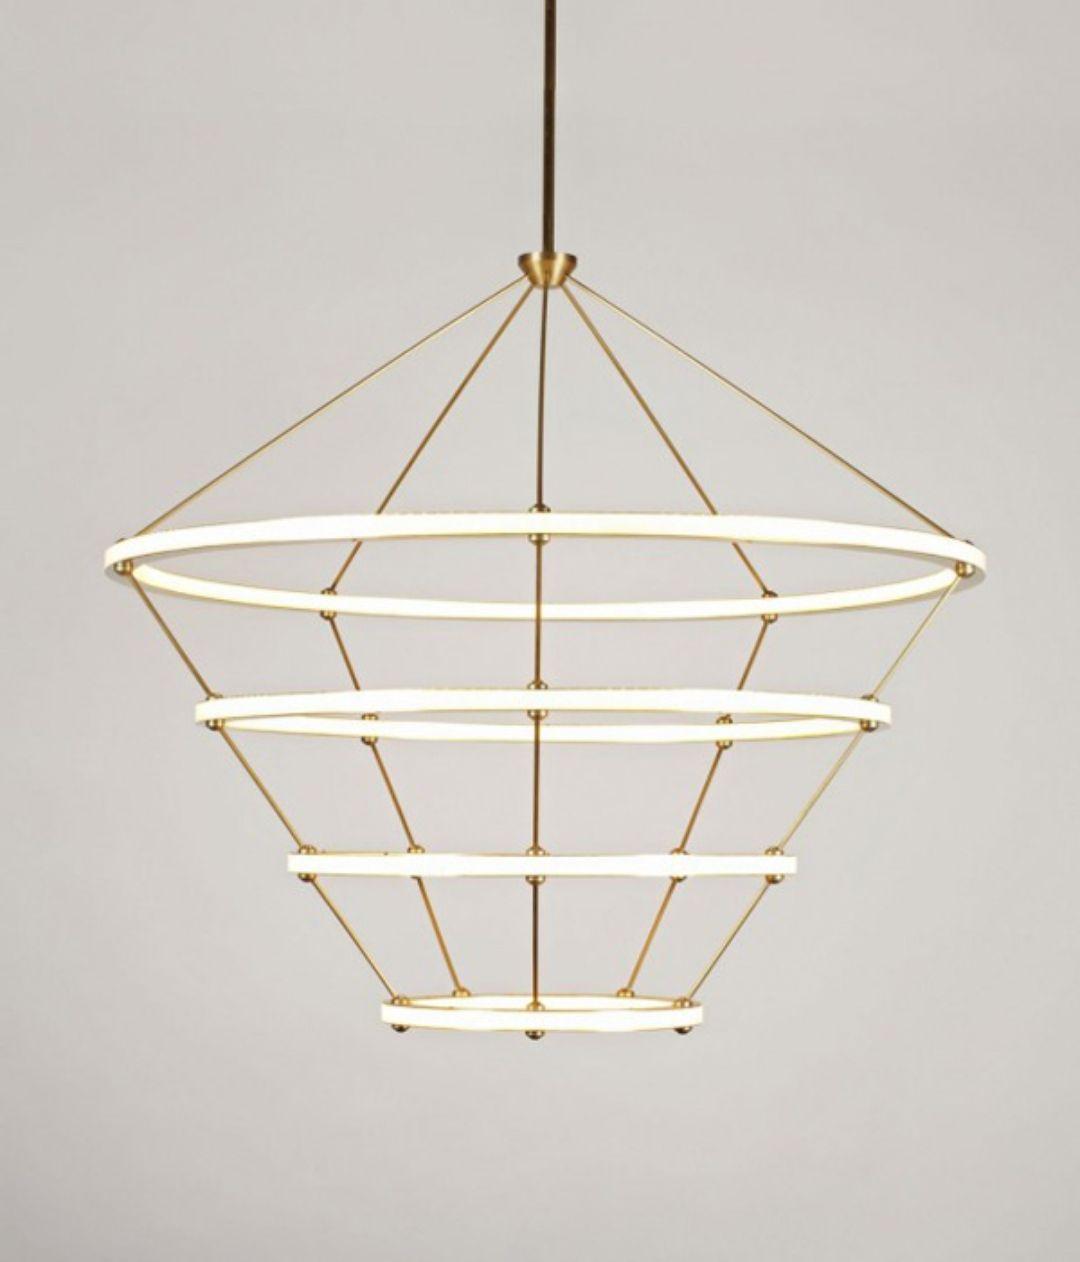 15 stunning minimalist chandeliers architizer lighting 15 stunning minimalist chandeliers architizer aloadofball Choice Image